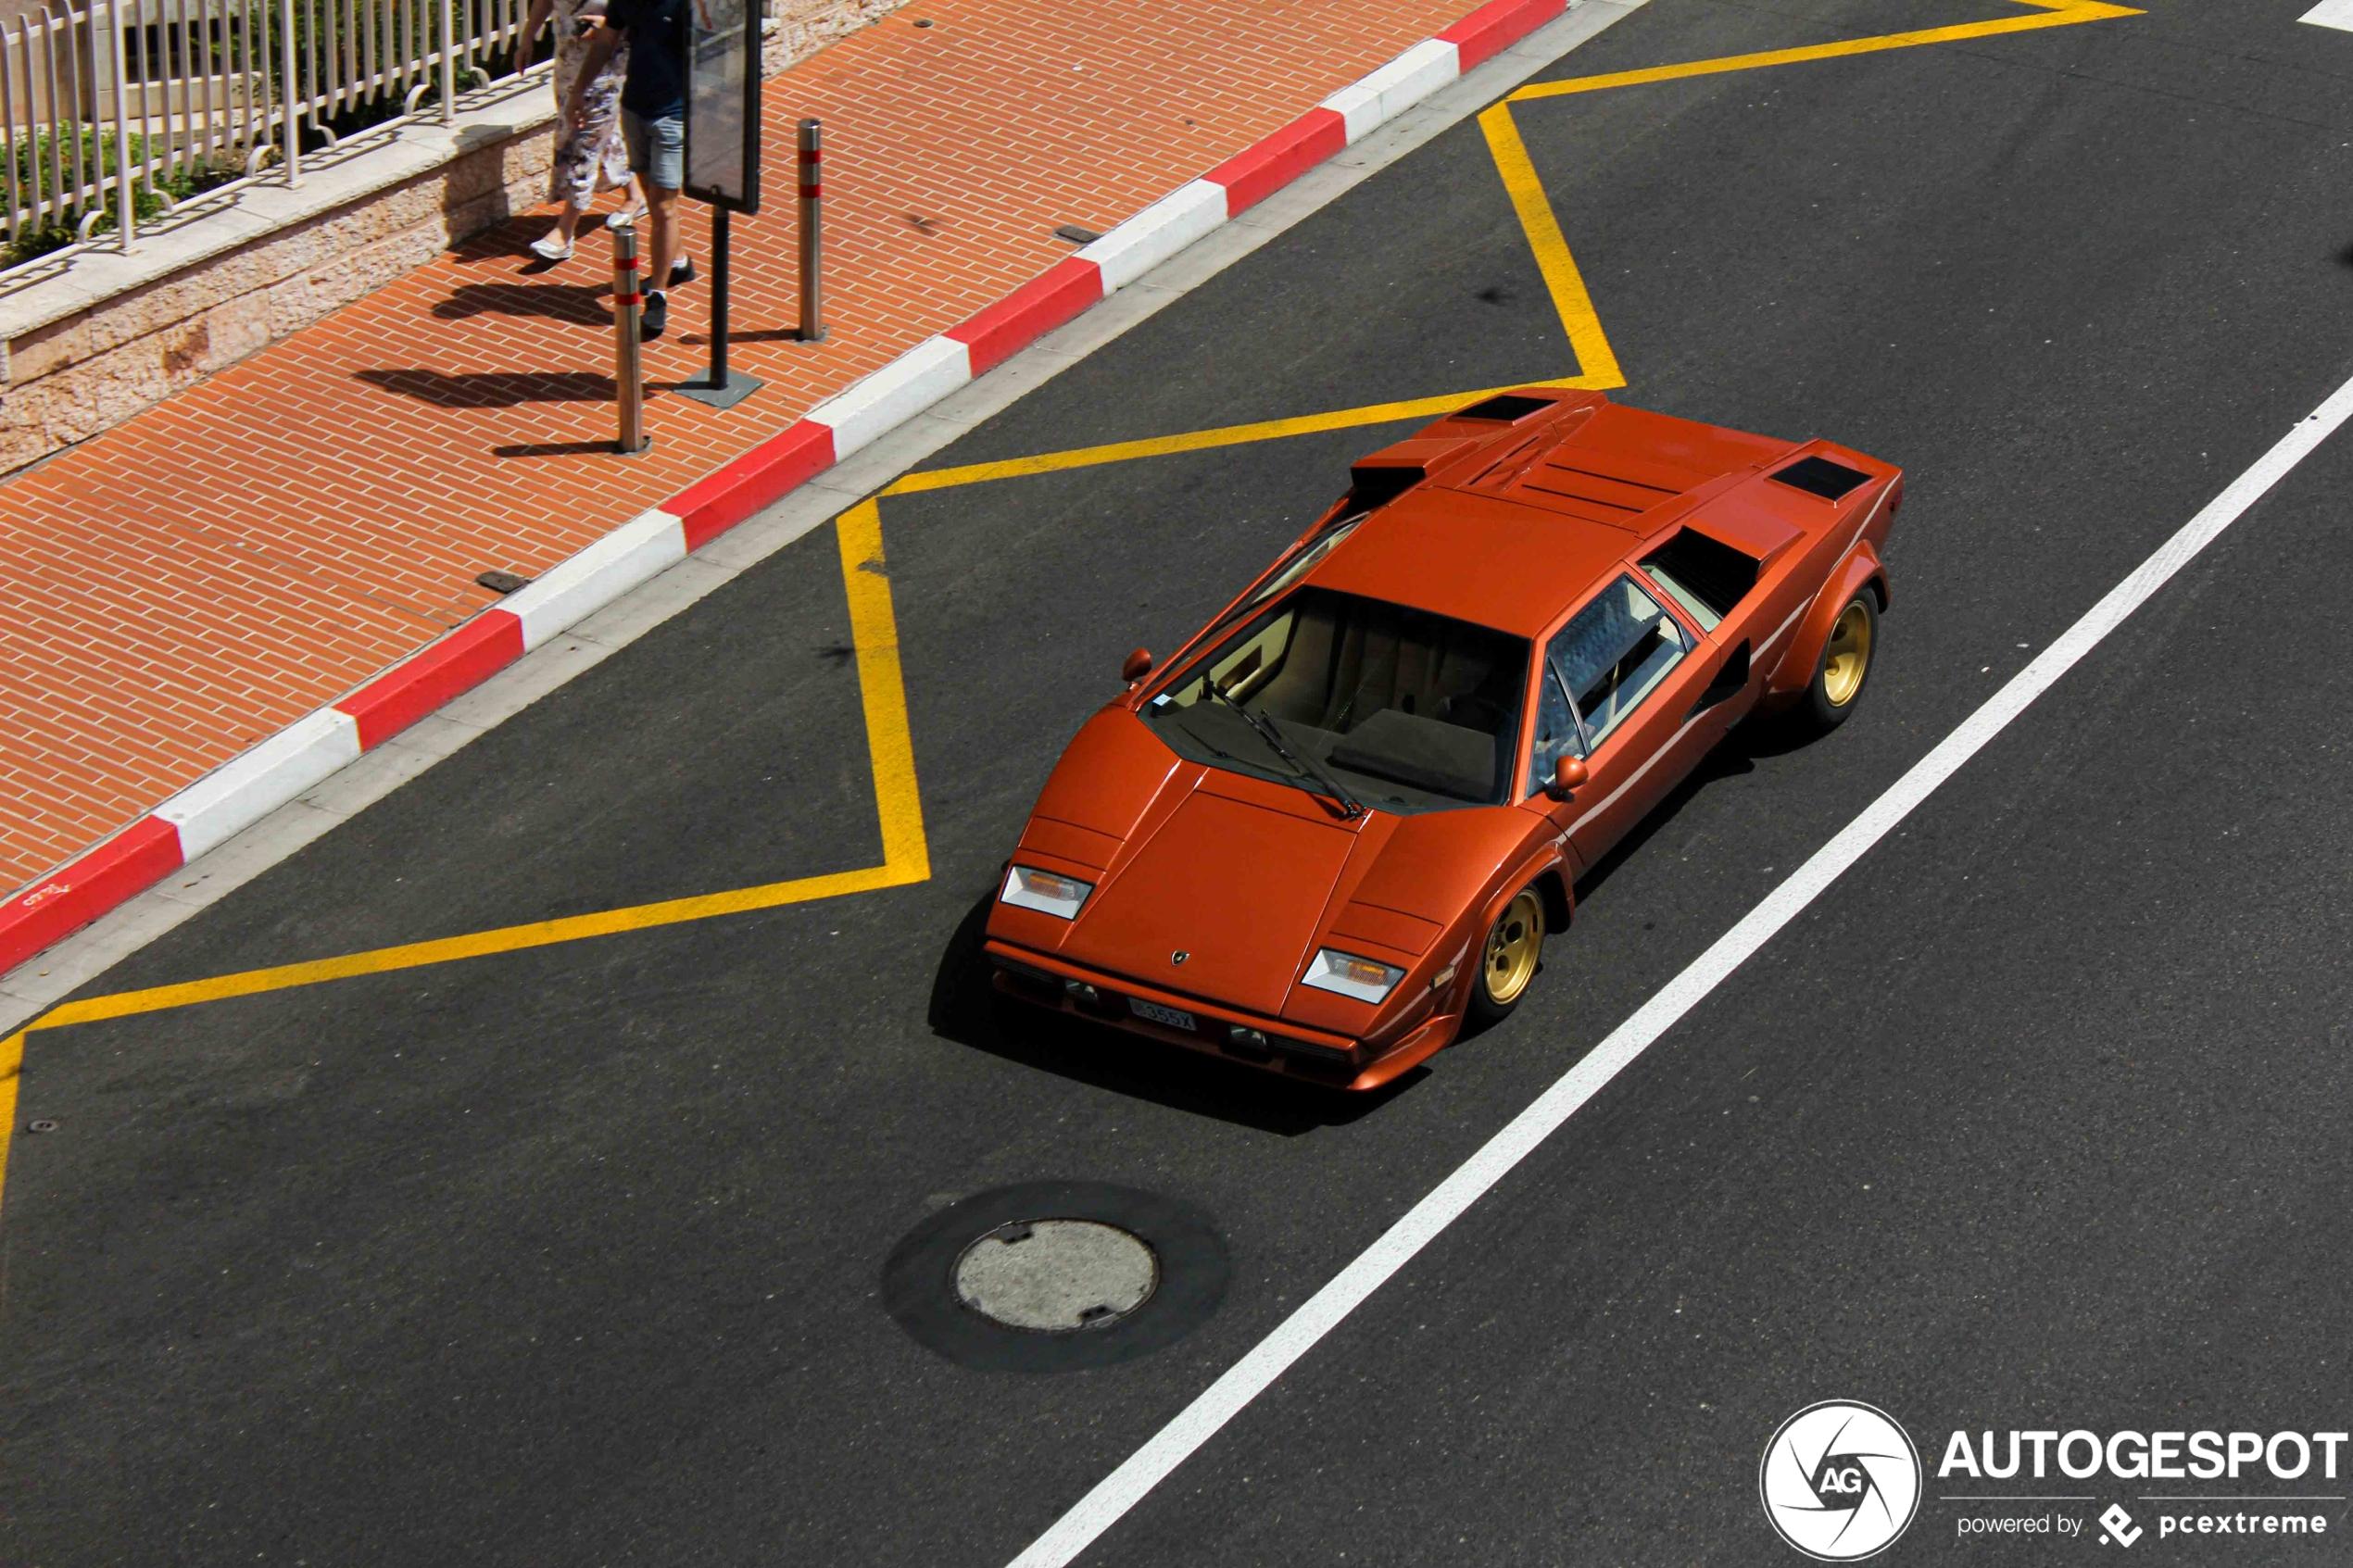 LamborghiniCountach LP400 S